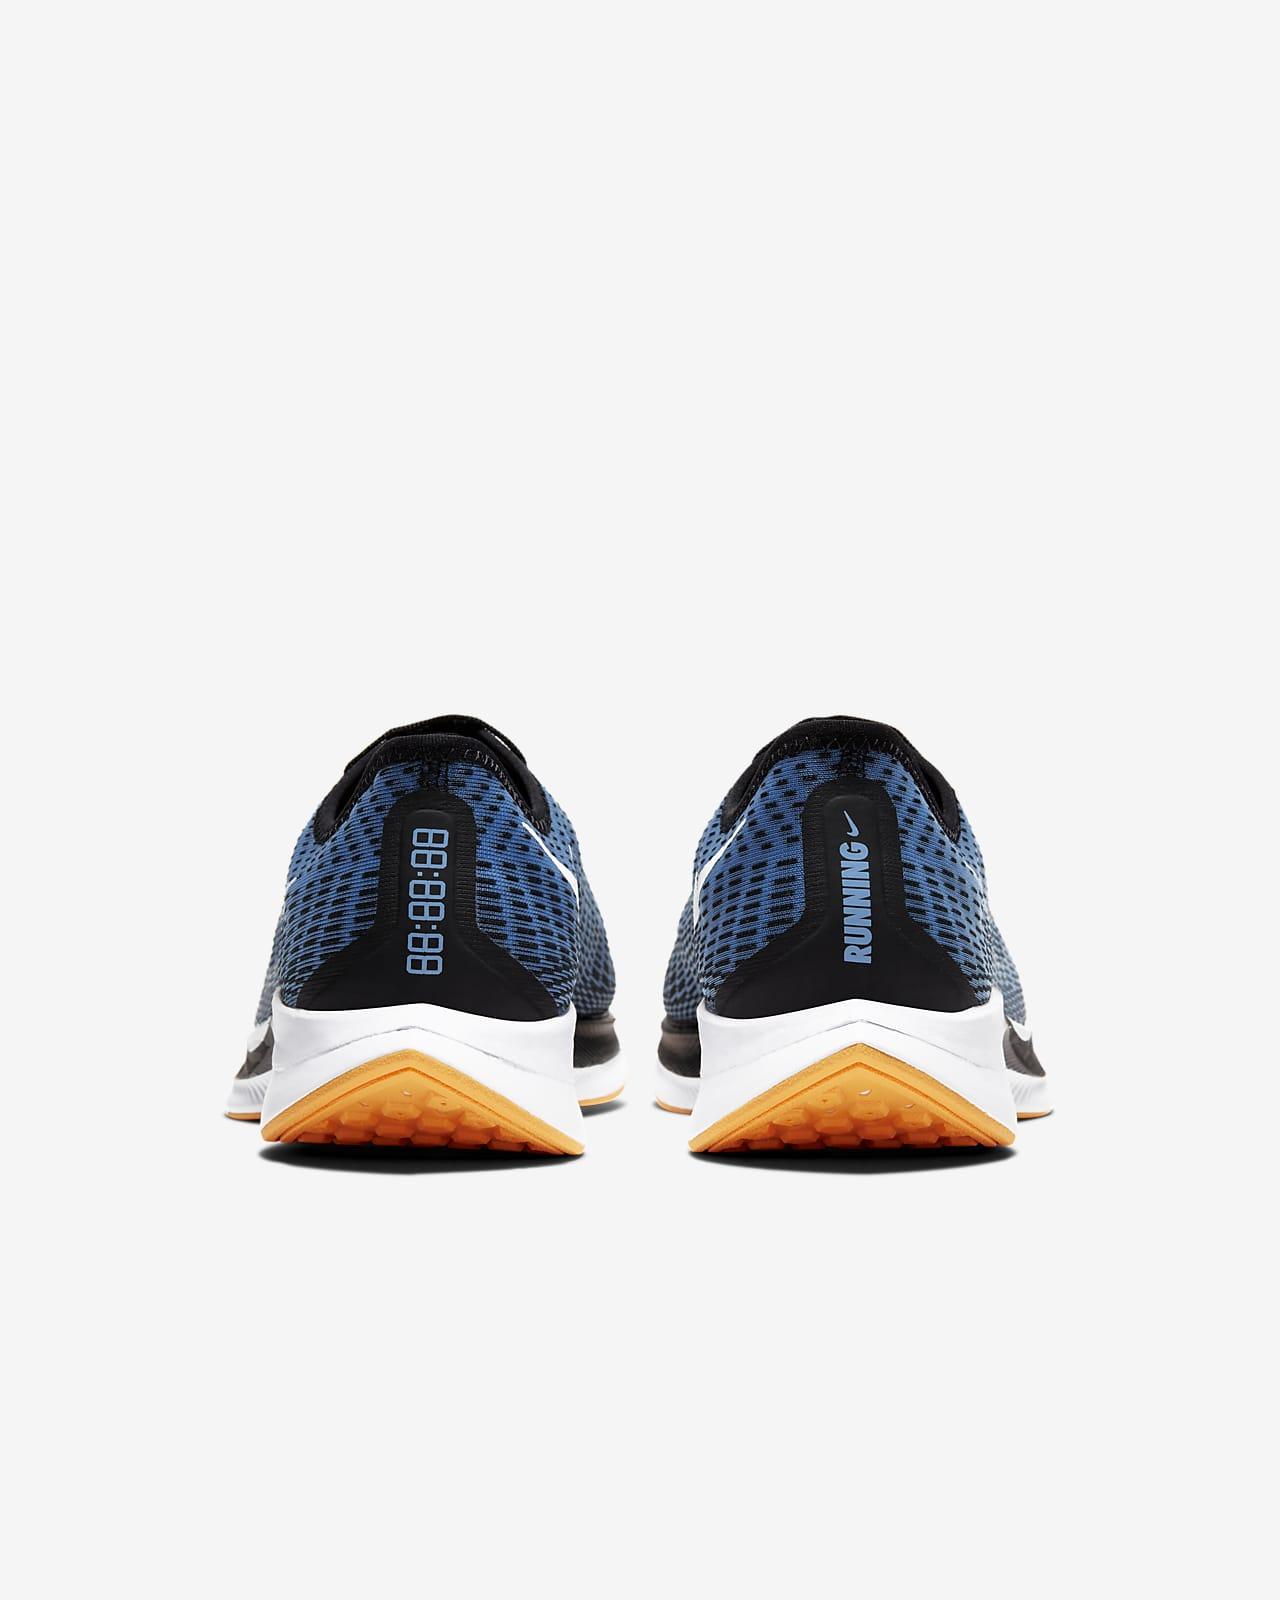 Revocación Interrupción Lidiar con  Nike Zoom Pegasus Turbo 2 Men's Running Shoe. Nike SE